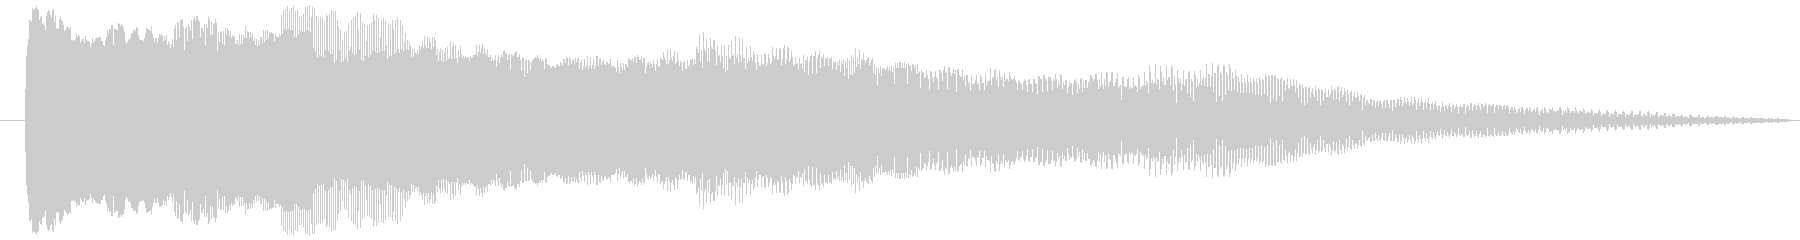 OLDPOWERバージョン2の未再生の波形